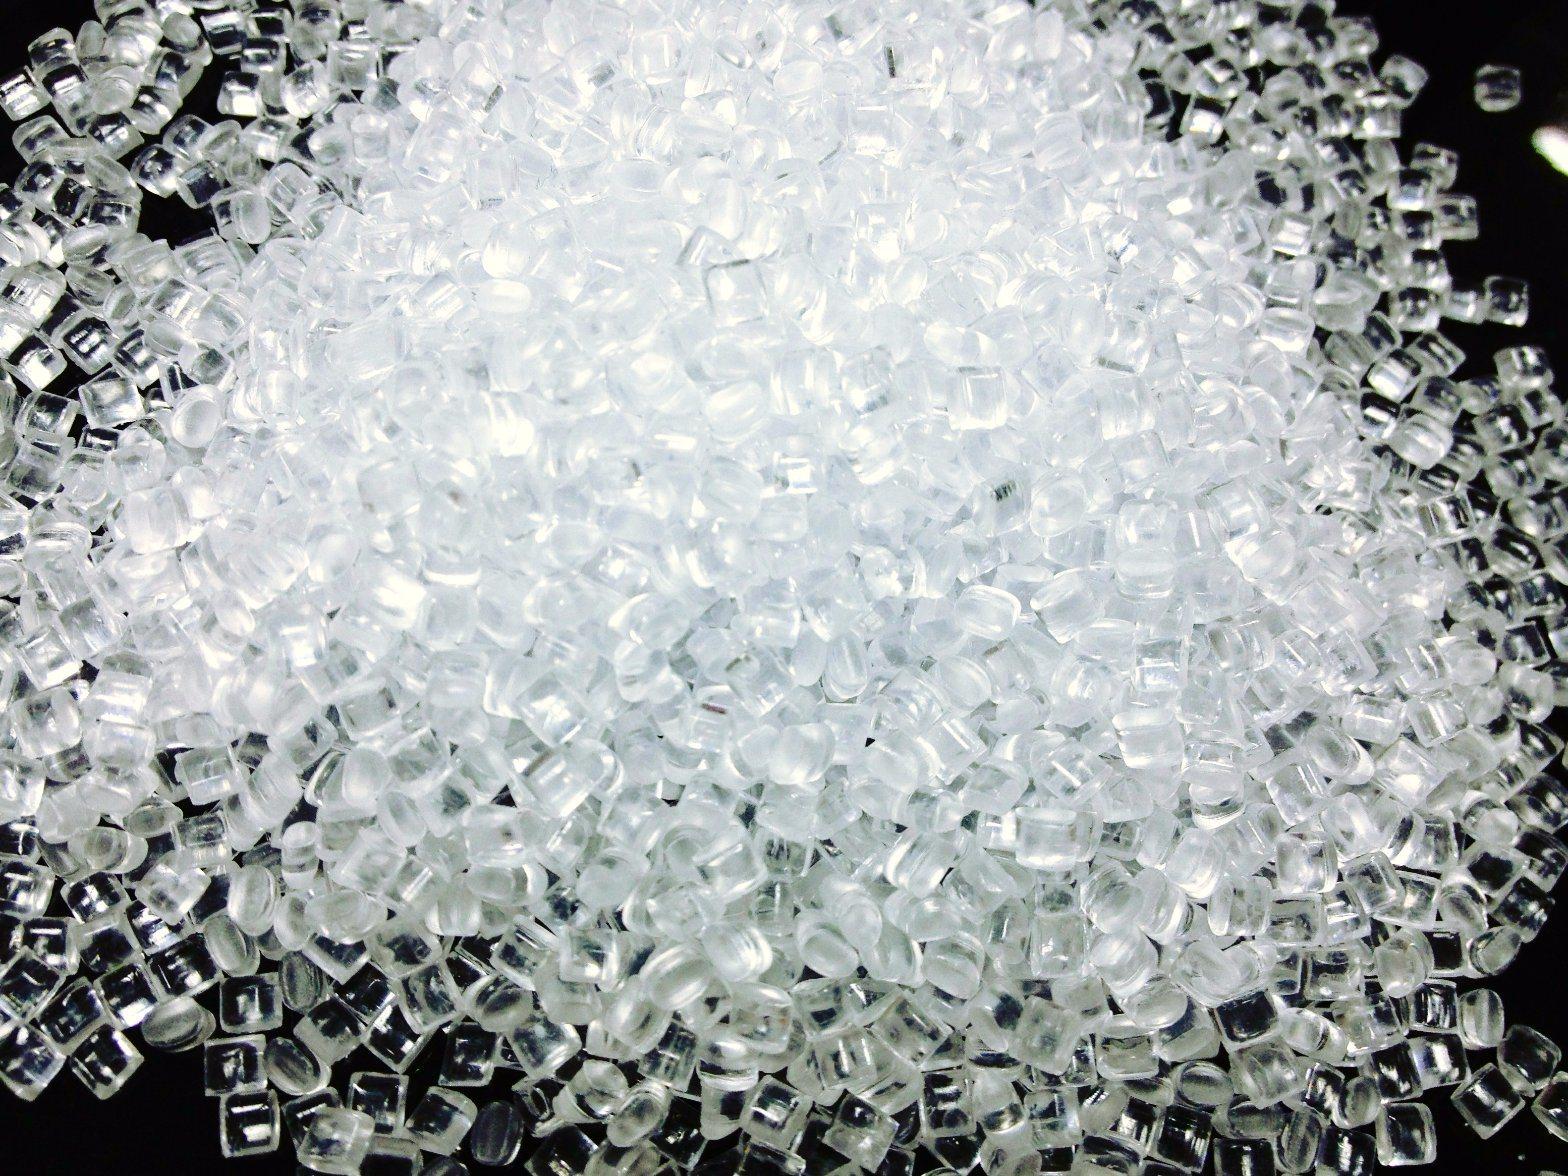 China PC Resin Virgin PC Resin Polycarbonate Resin with High Quality -  China PC, Polycarbonate